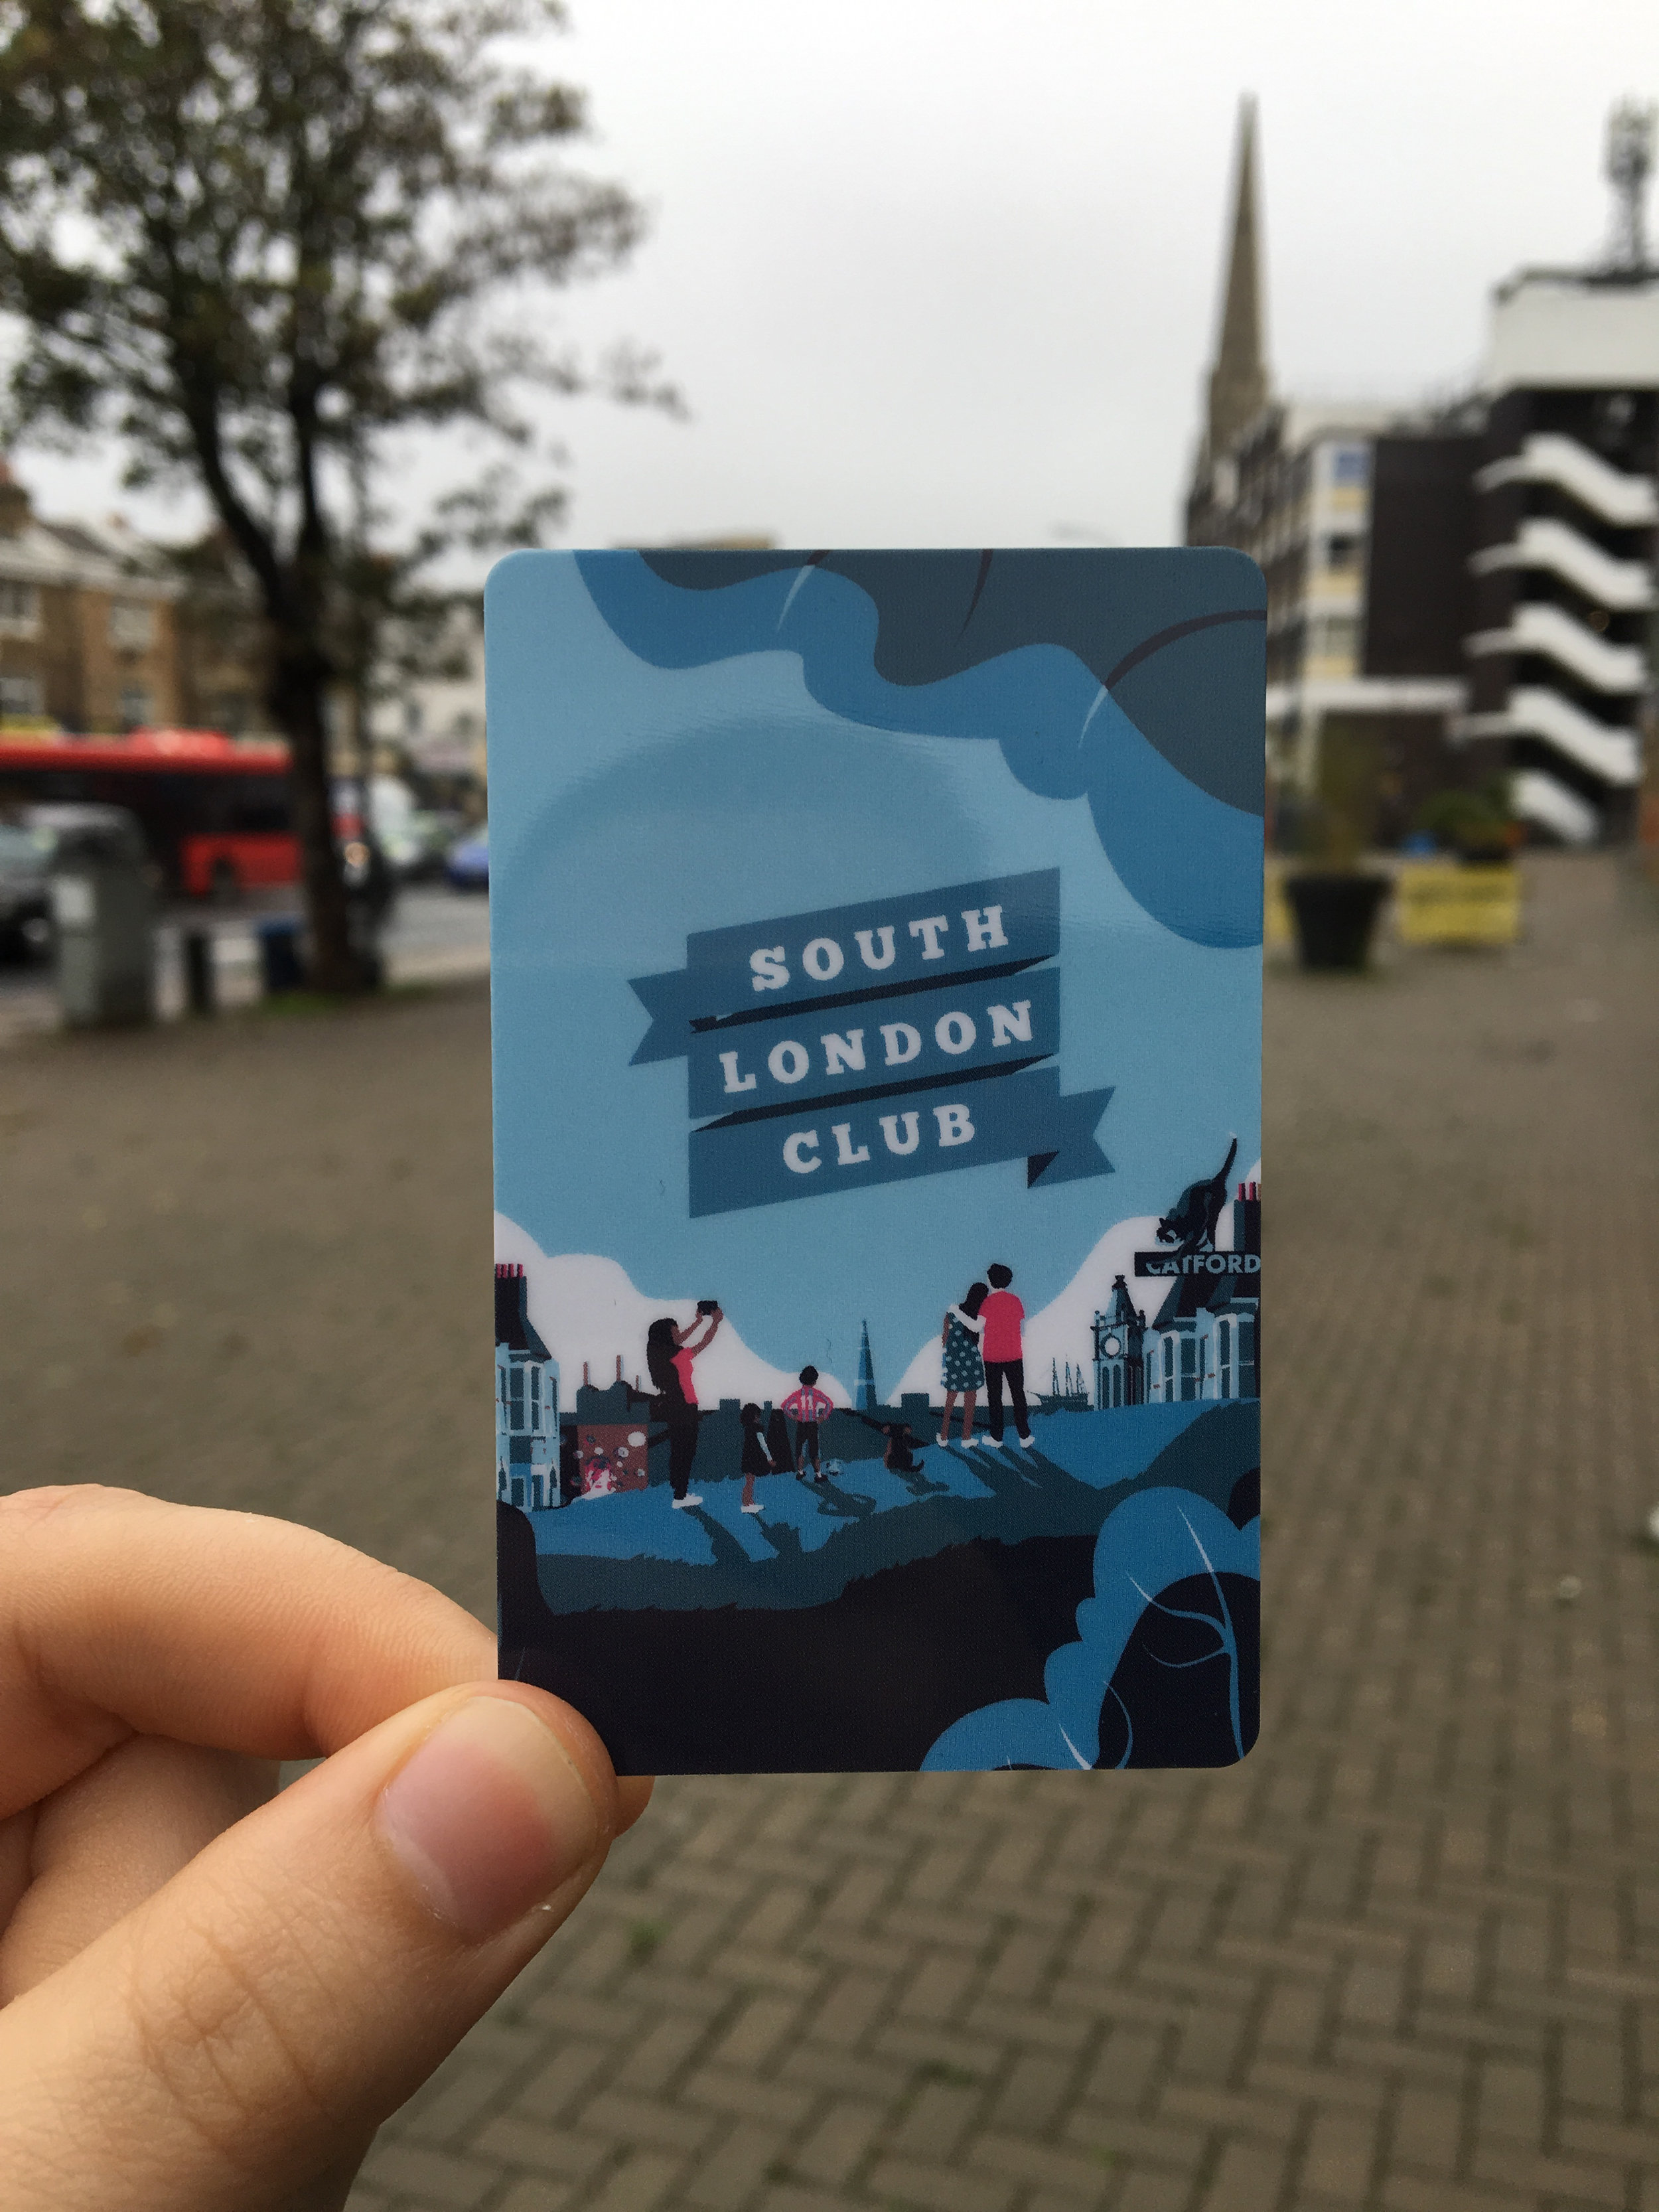 south london club card.jpg